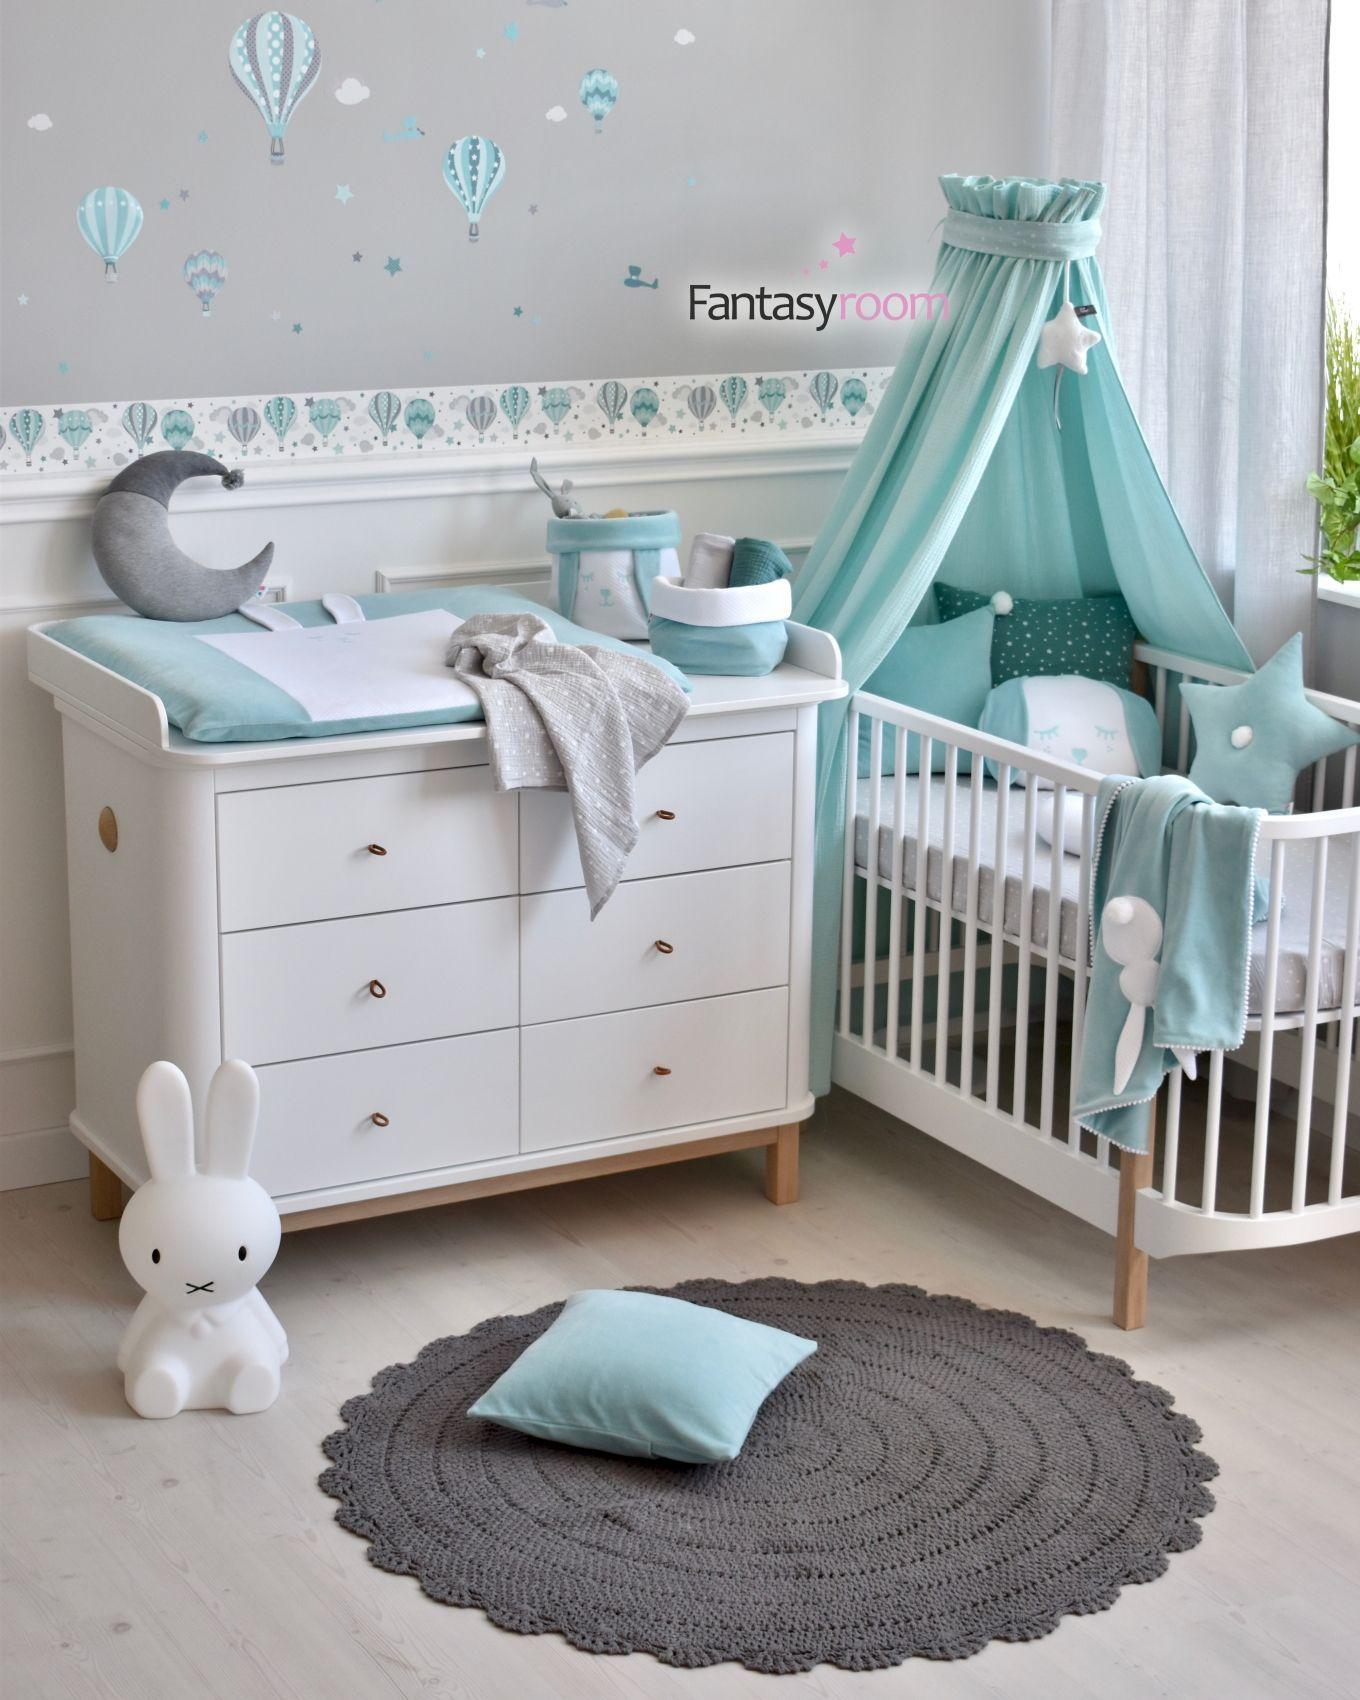 Excellent Free Velvet baby equipment from Dinki Balloon Ideas Got